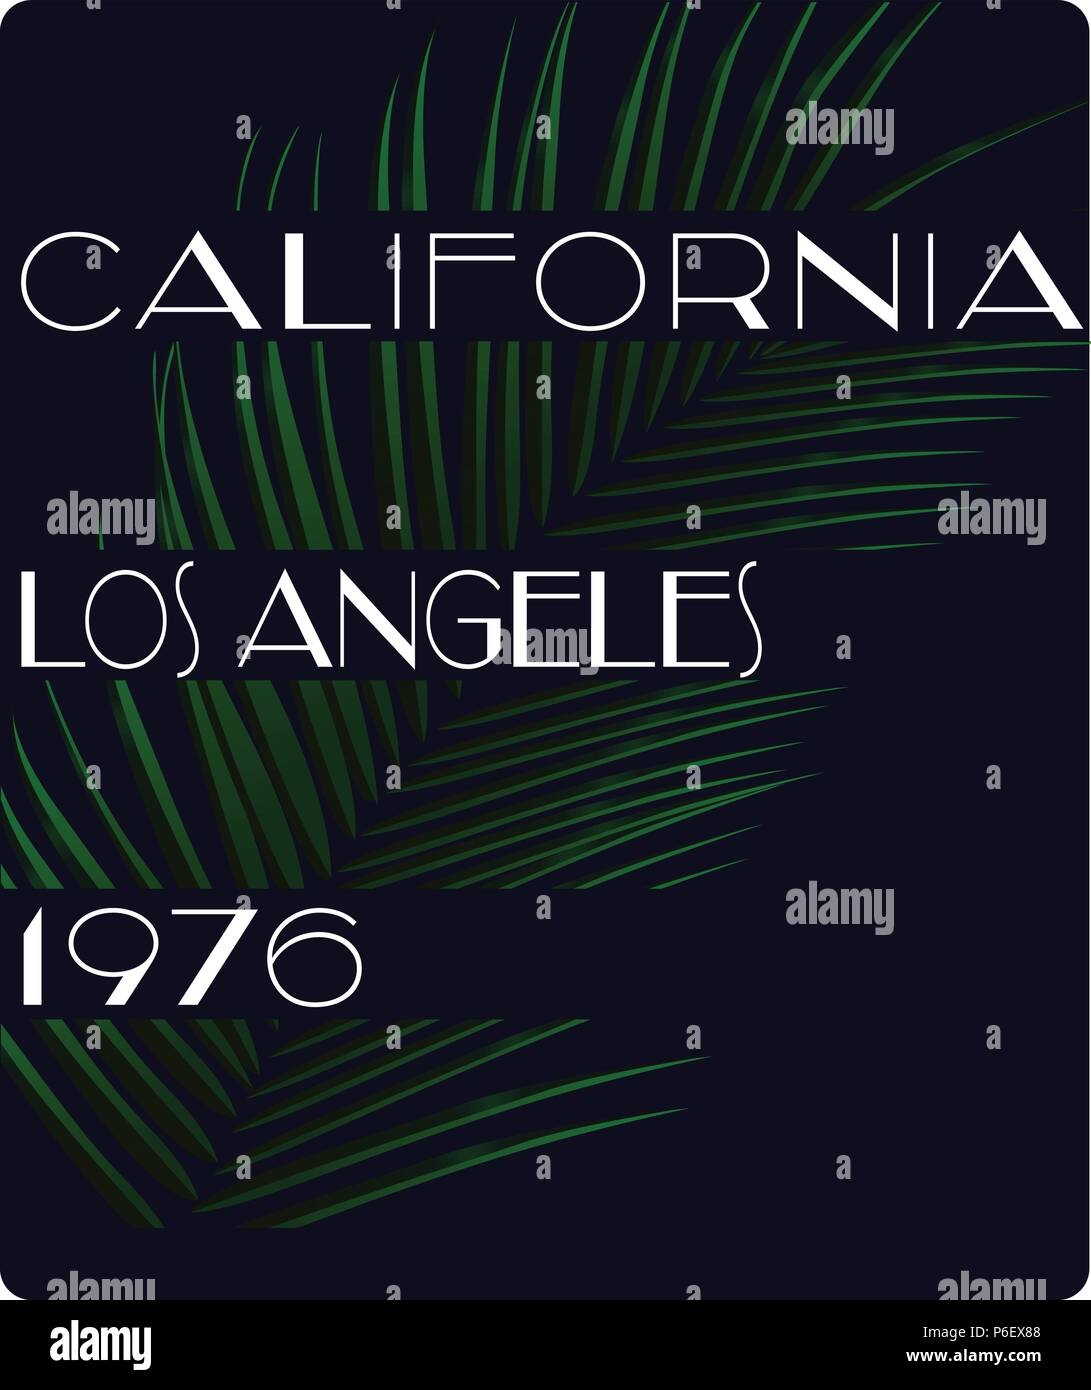 Vintage Retro California Lema Estilo Veraniego Diseño